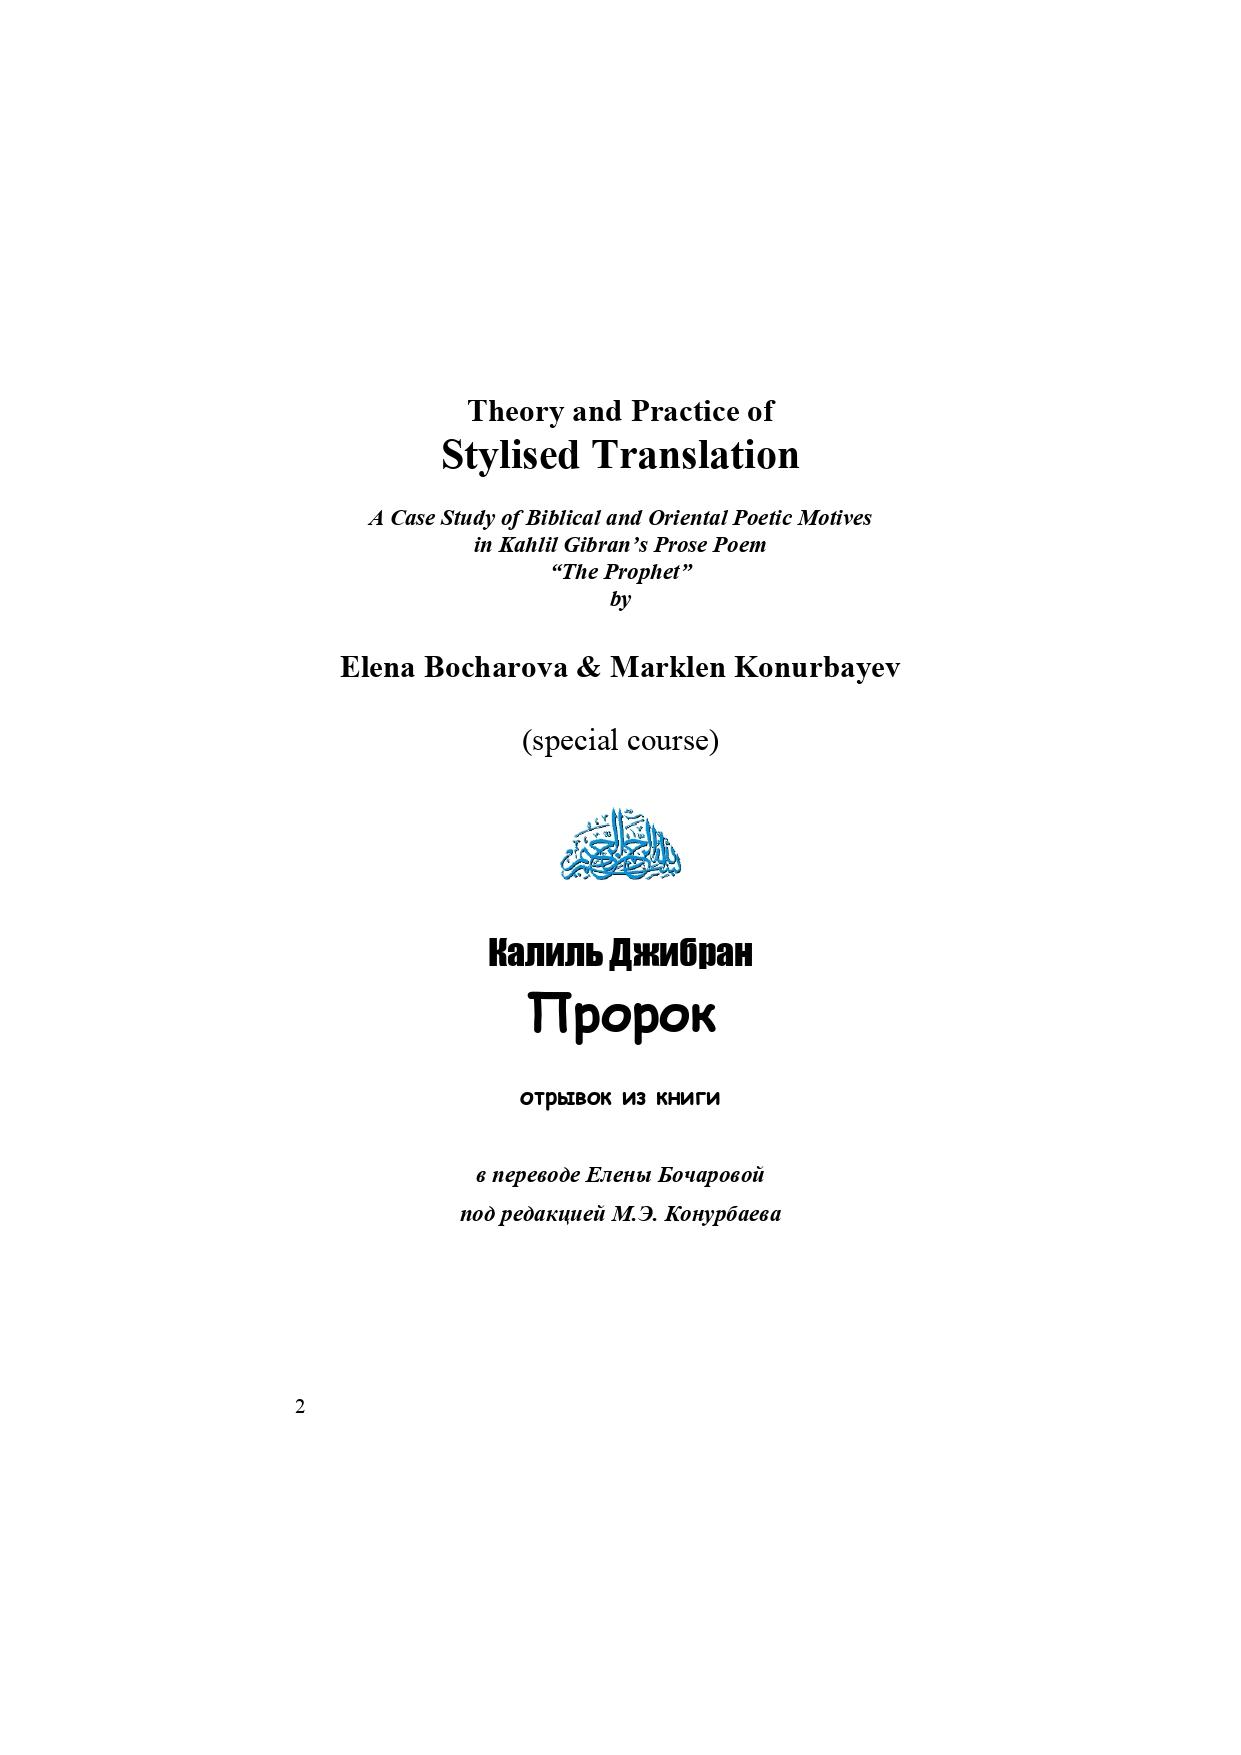 "Elena Bocharova & Marklen Konurbayev, A Case Study of Biblical and Oriental Poetic Motives in Kahlil Gibran's Prose Poem ""The Prophet"", Moscow: Max Press, 2001 (Russian/English)."